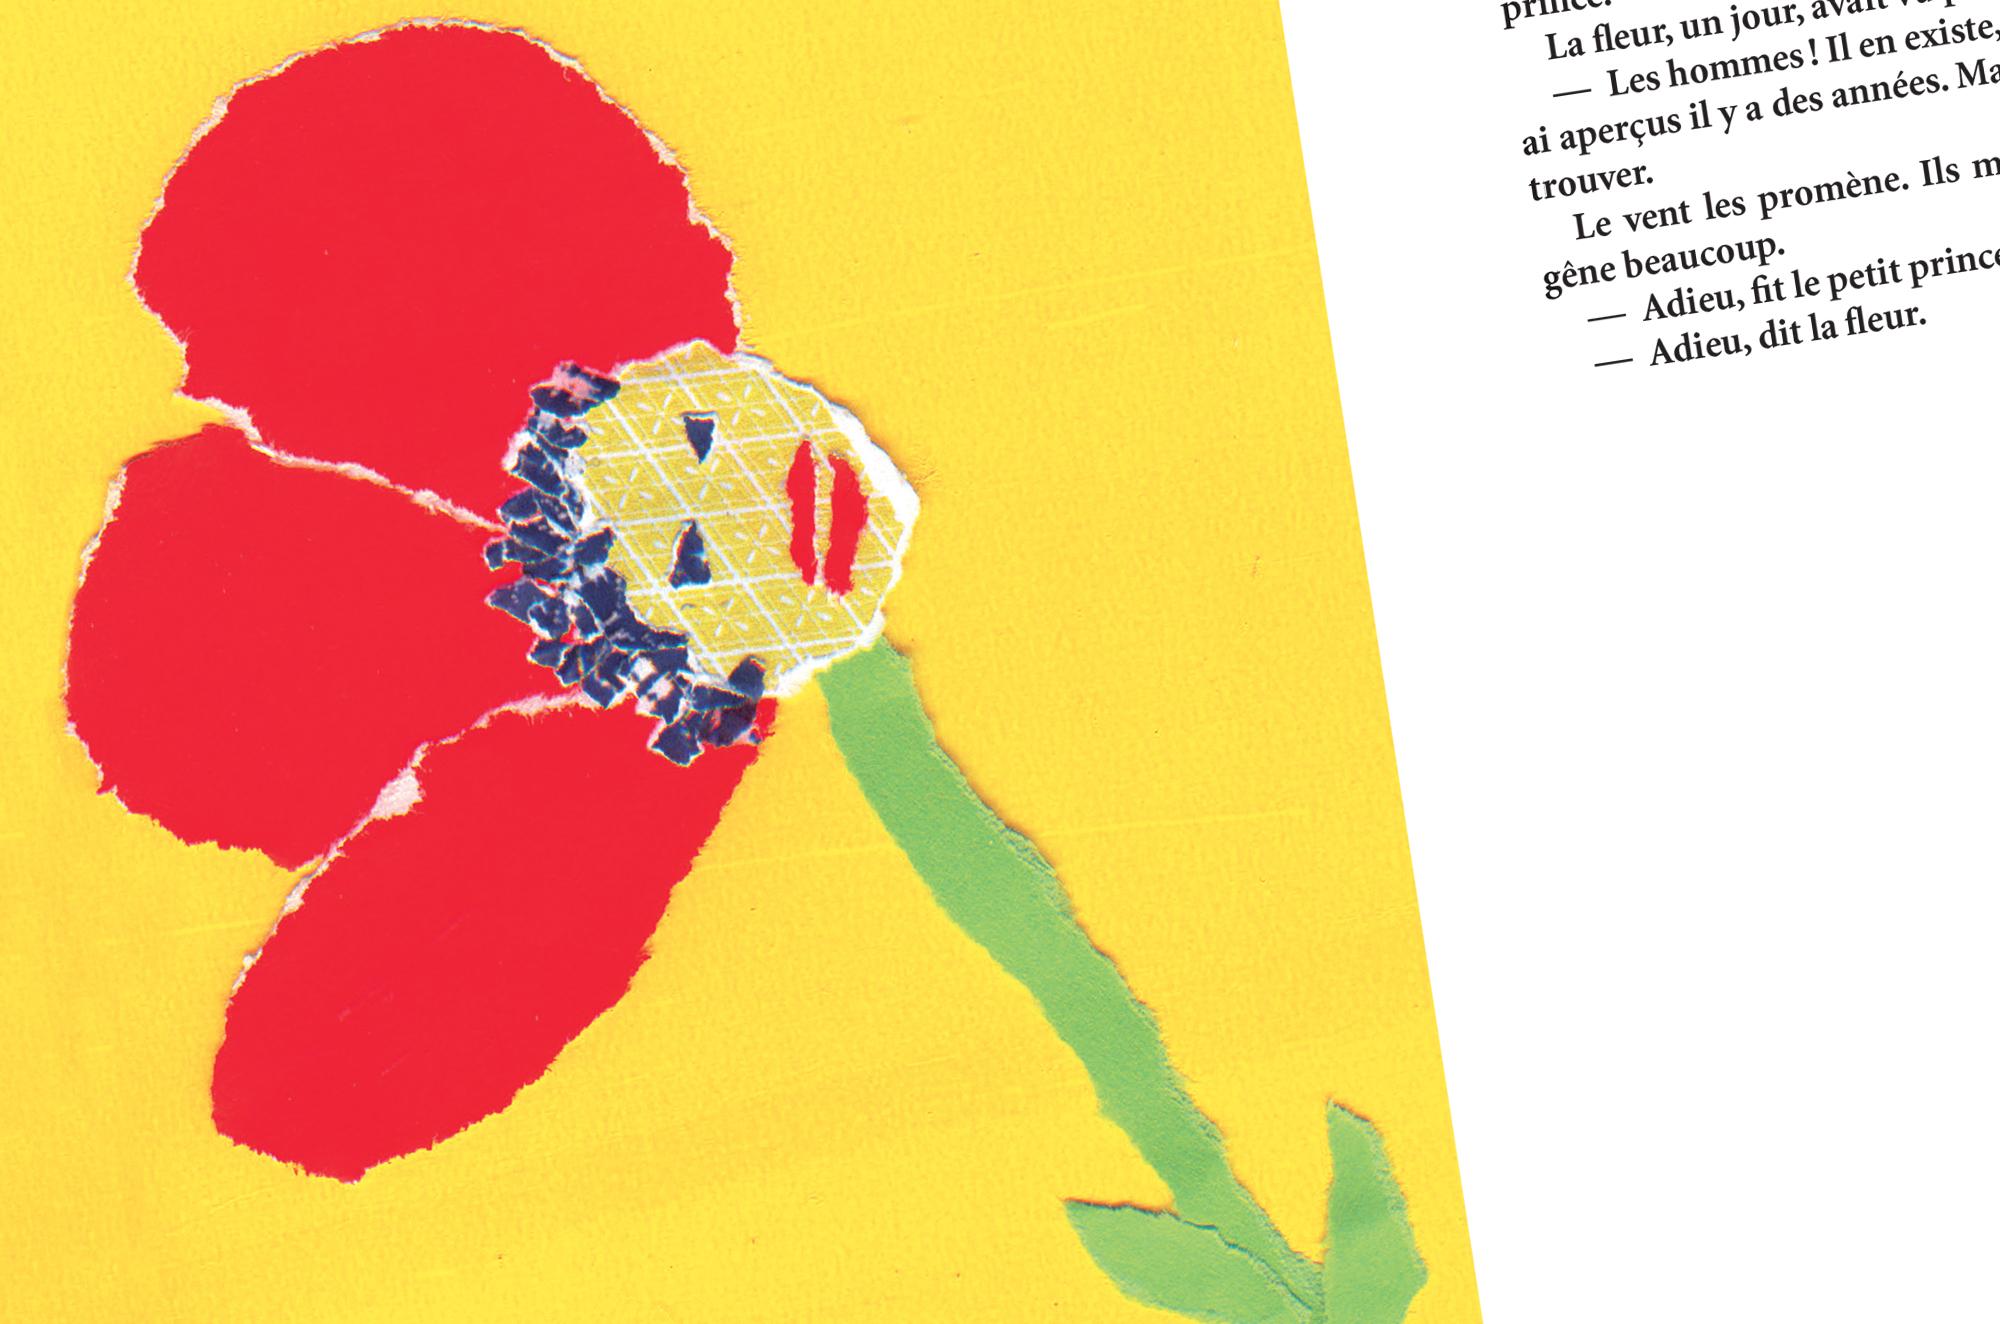 edition-livre-lepetitprince16